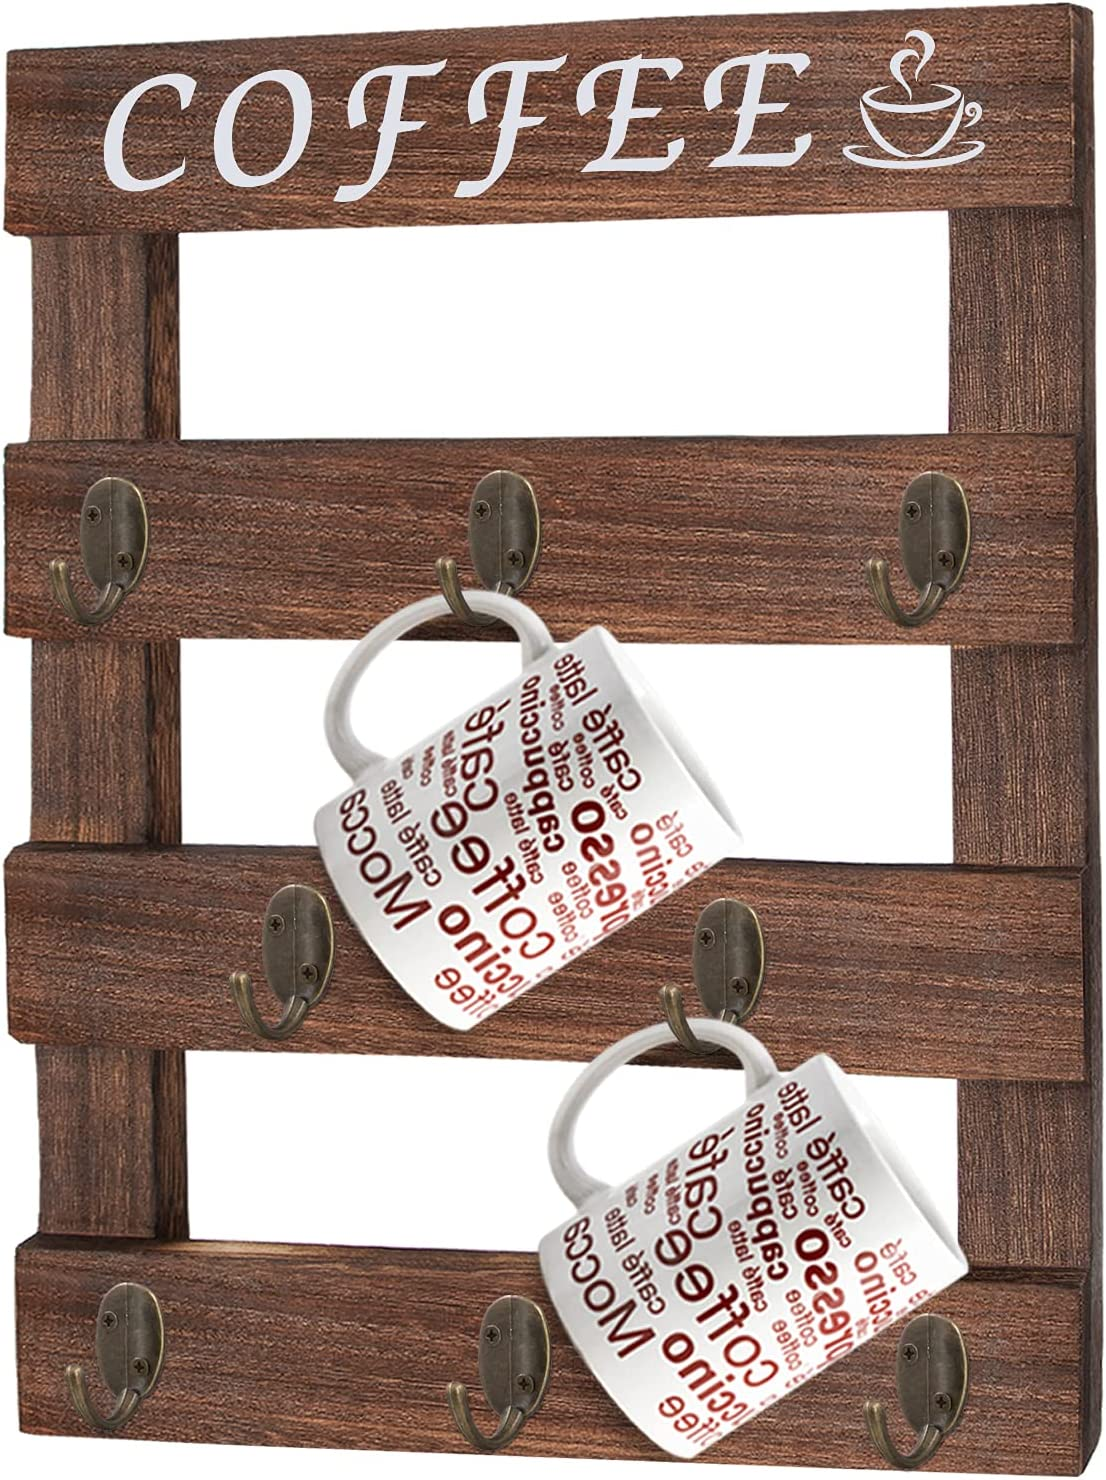 Qlfyuu Coffee Mug Holder Wall Mounted,Coffee Cup Holder with Coffee Sign,Farmhouse Coffee Mug Holder for Wall,Rustic Mug Rack with Hooks for Home Kitchen Display Storage and Collection(Brown)